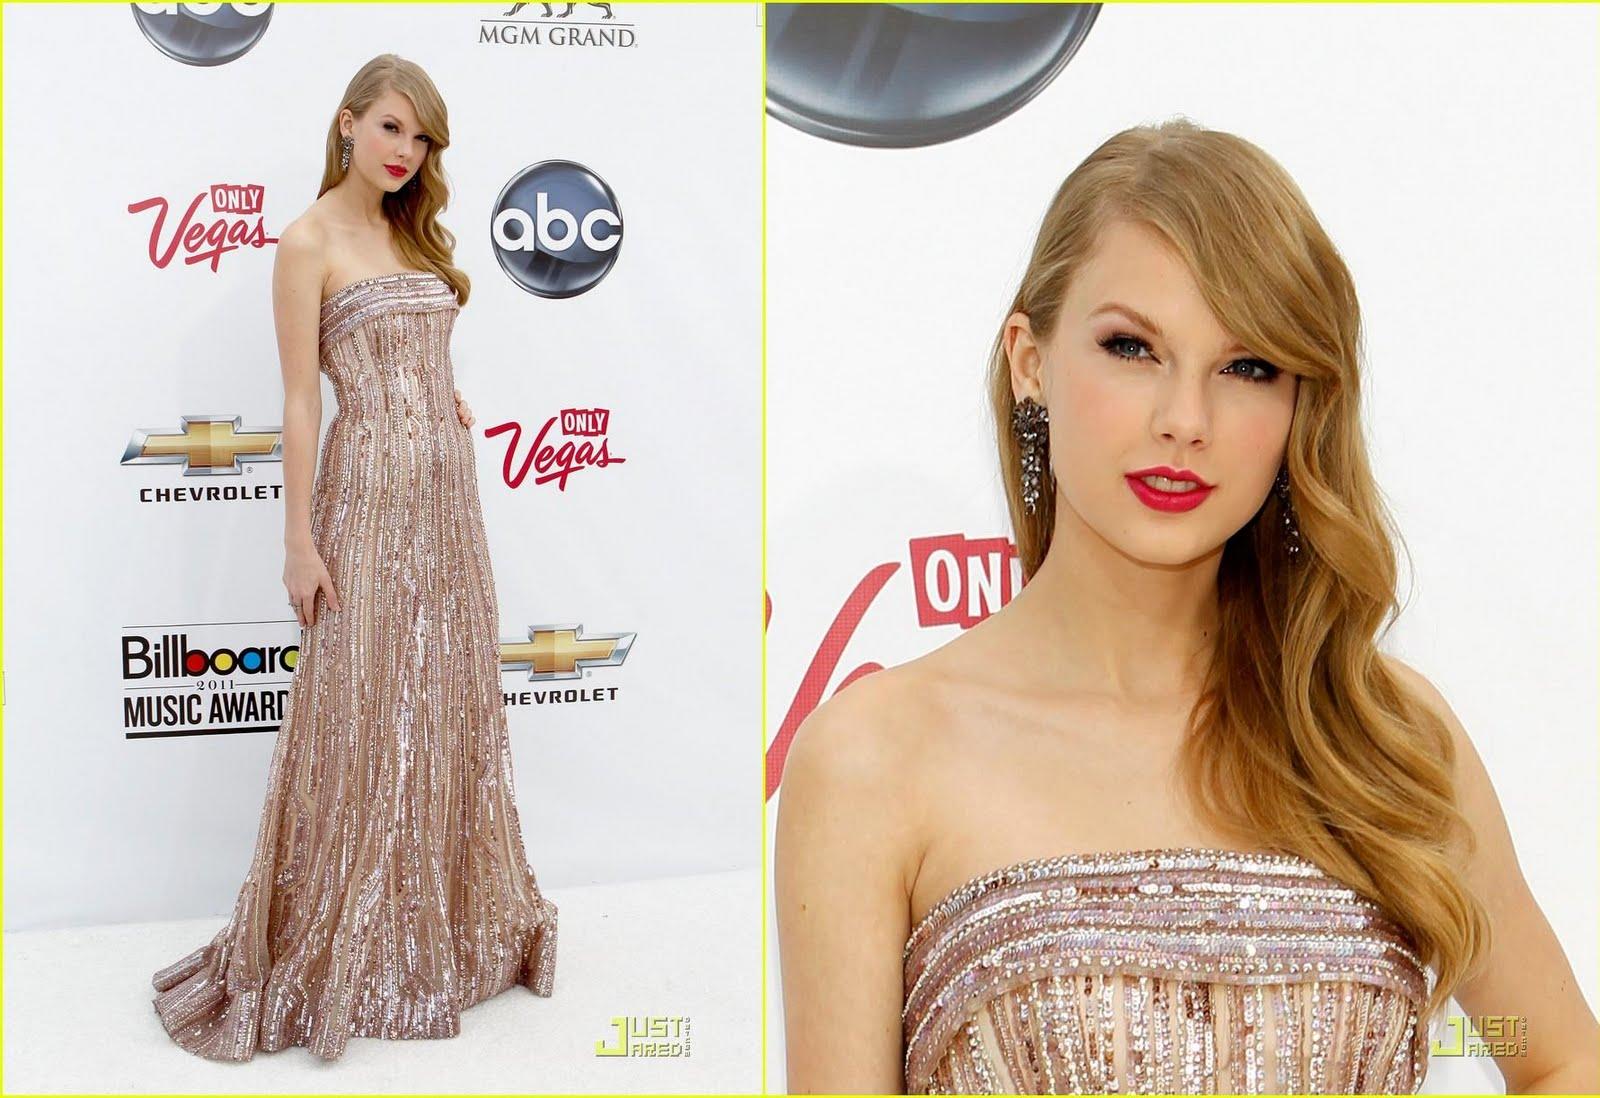 http://1.bp.blogspot.com/-C_iR9Xo1qEU/Td3IzTMk2UI/AAAAAAAABu4/f-ViAm7wmMw/s1600/taylor-swift-billboard-awards-2011-01.jpg